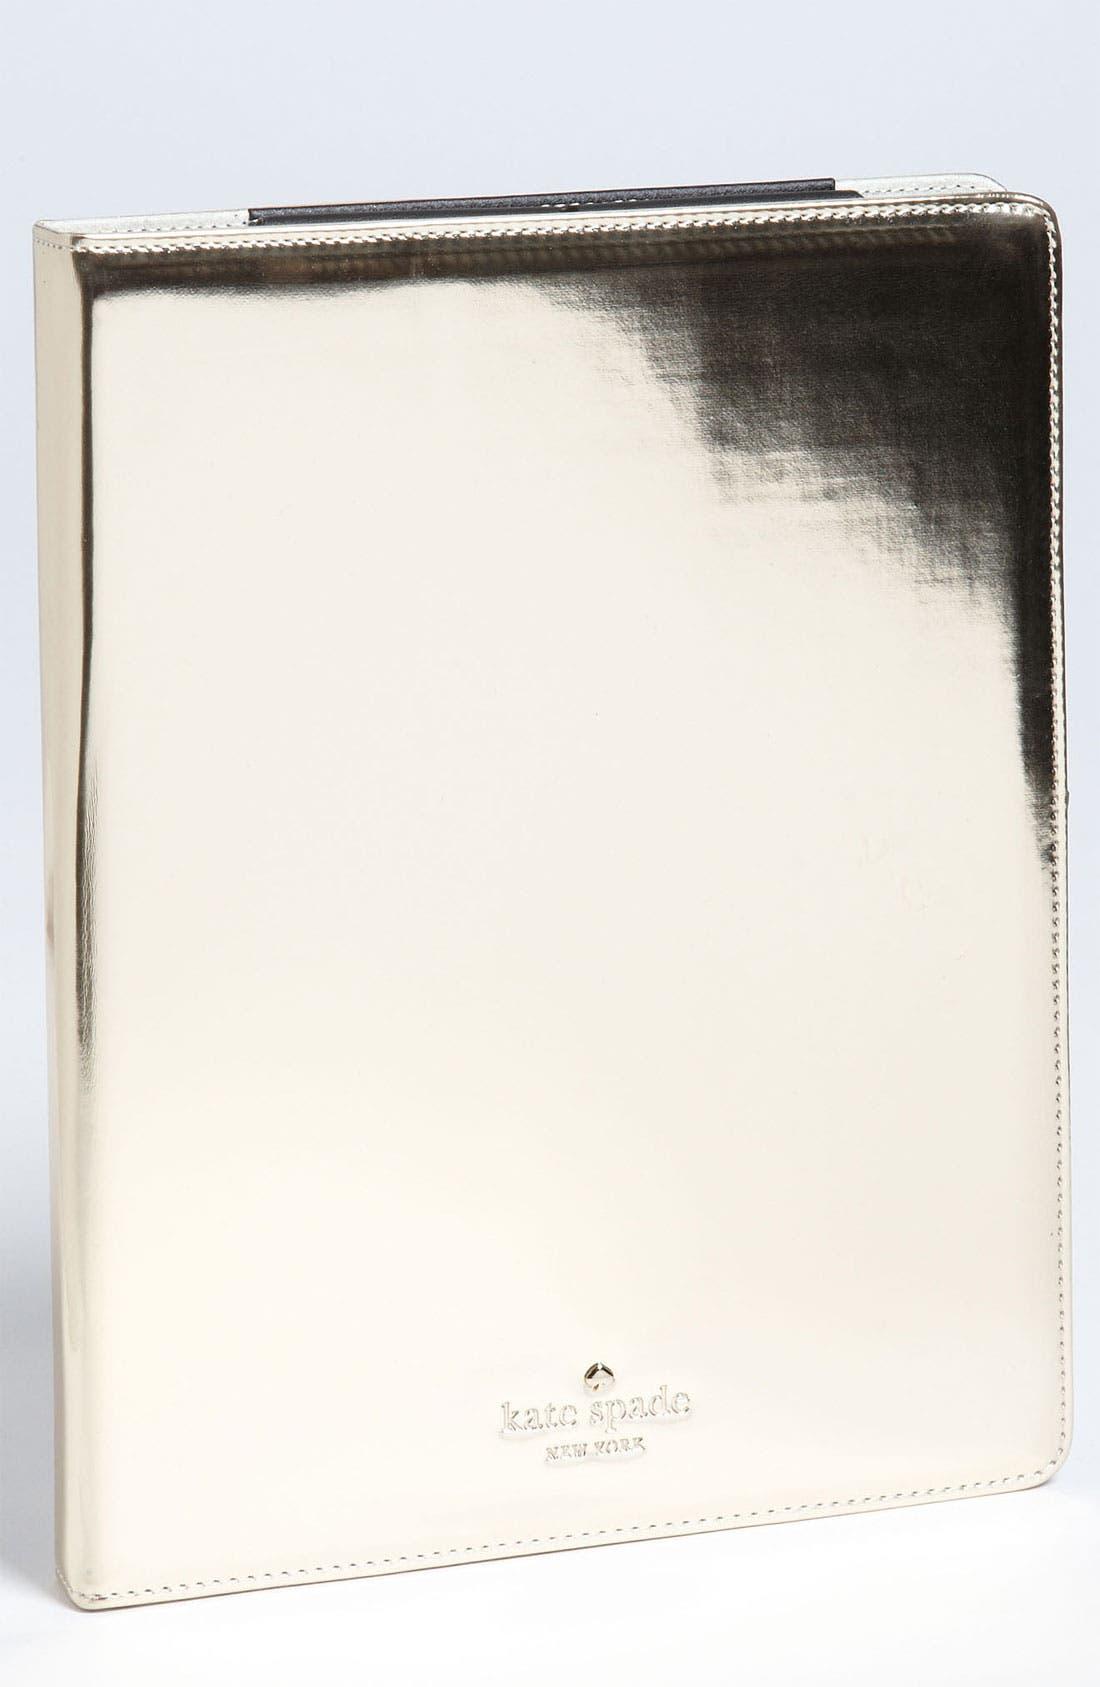 Alternate Image 1 Selected - kate spade new york iPad 2 & 3 folio